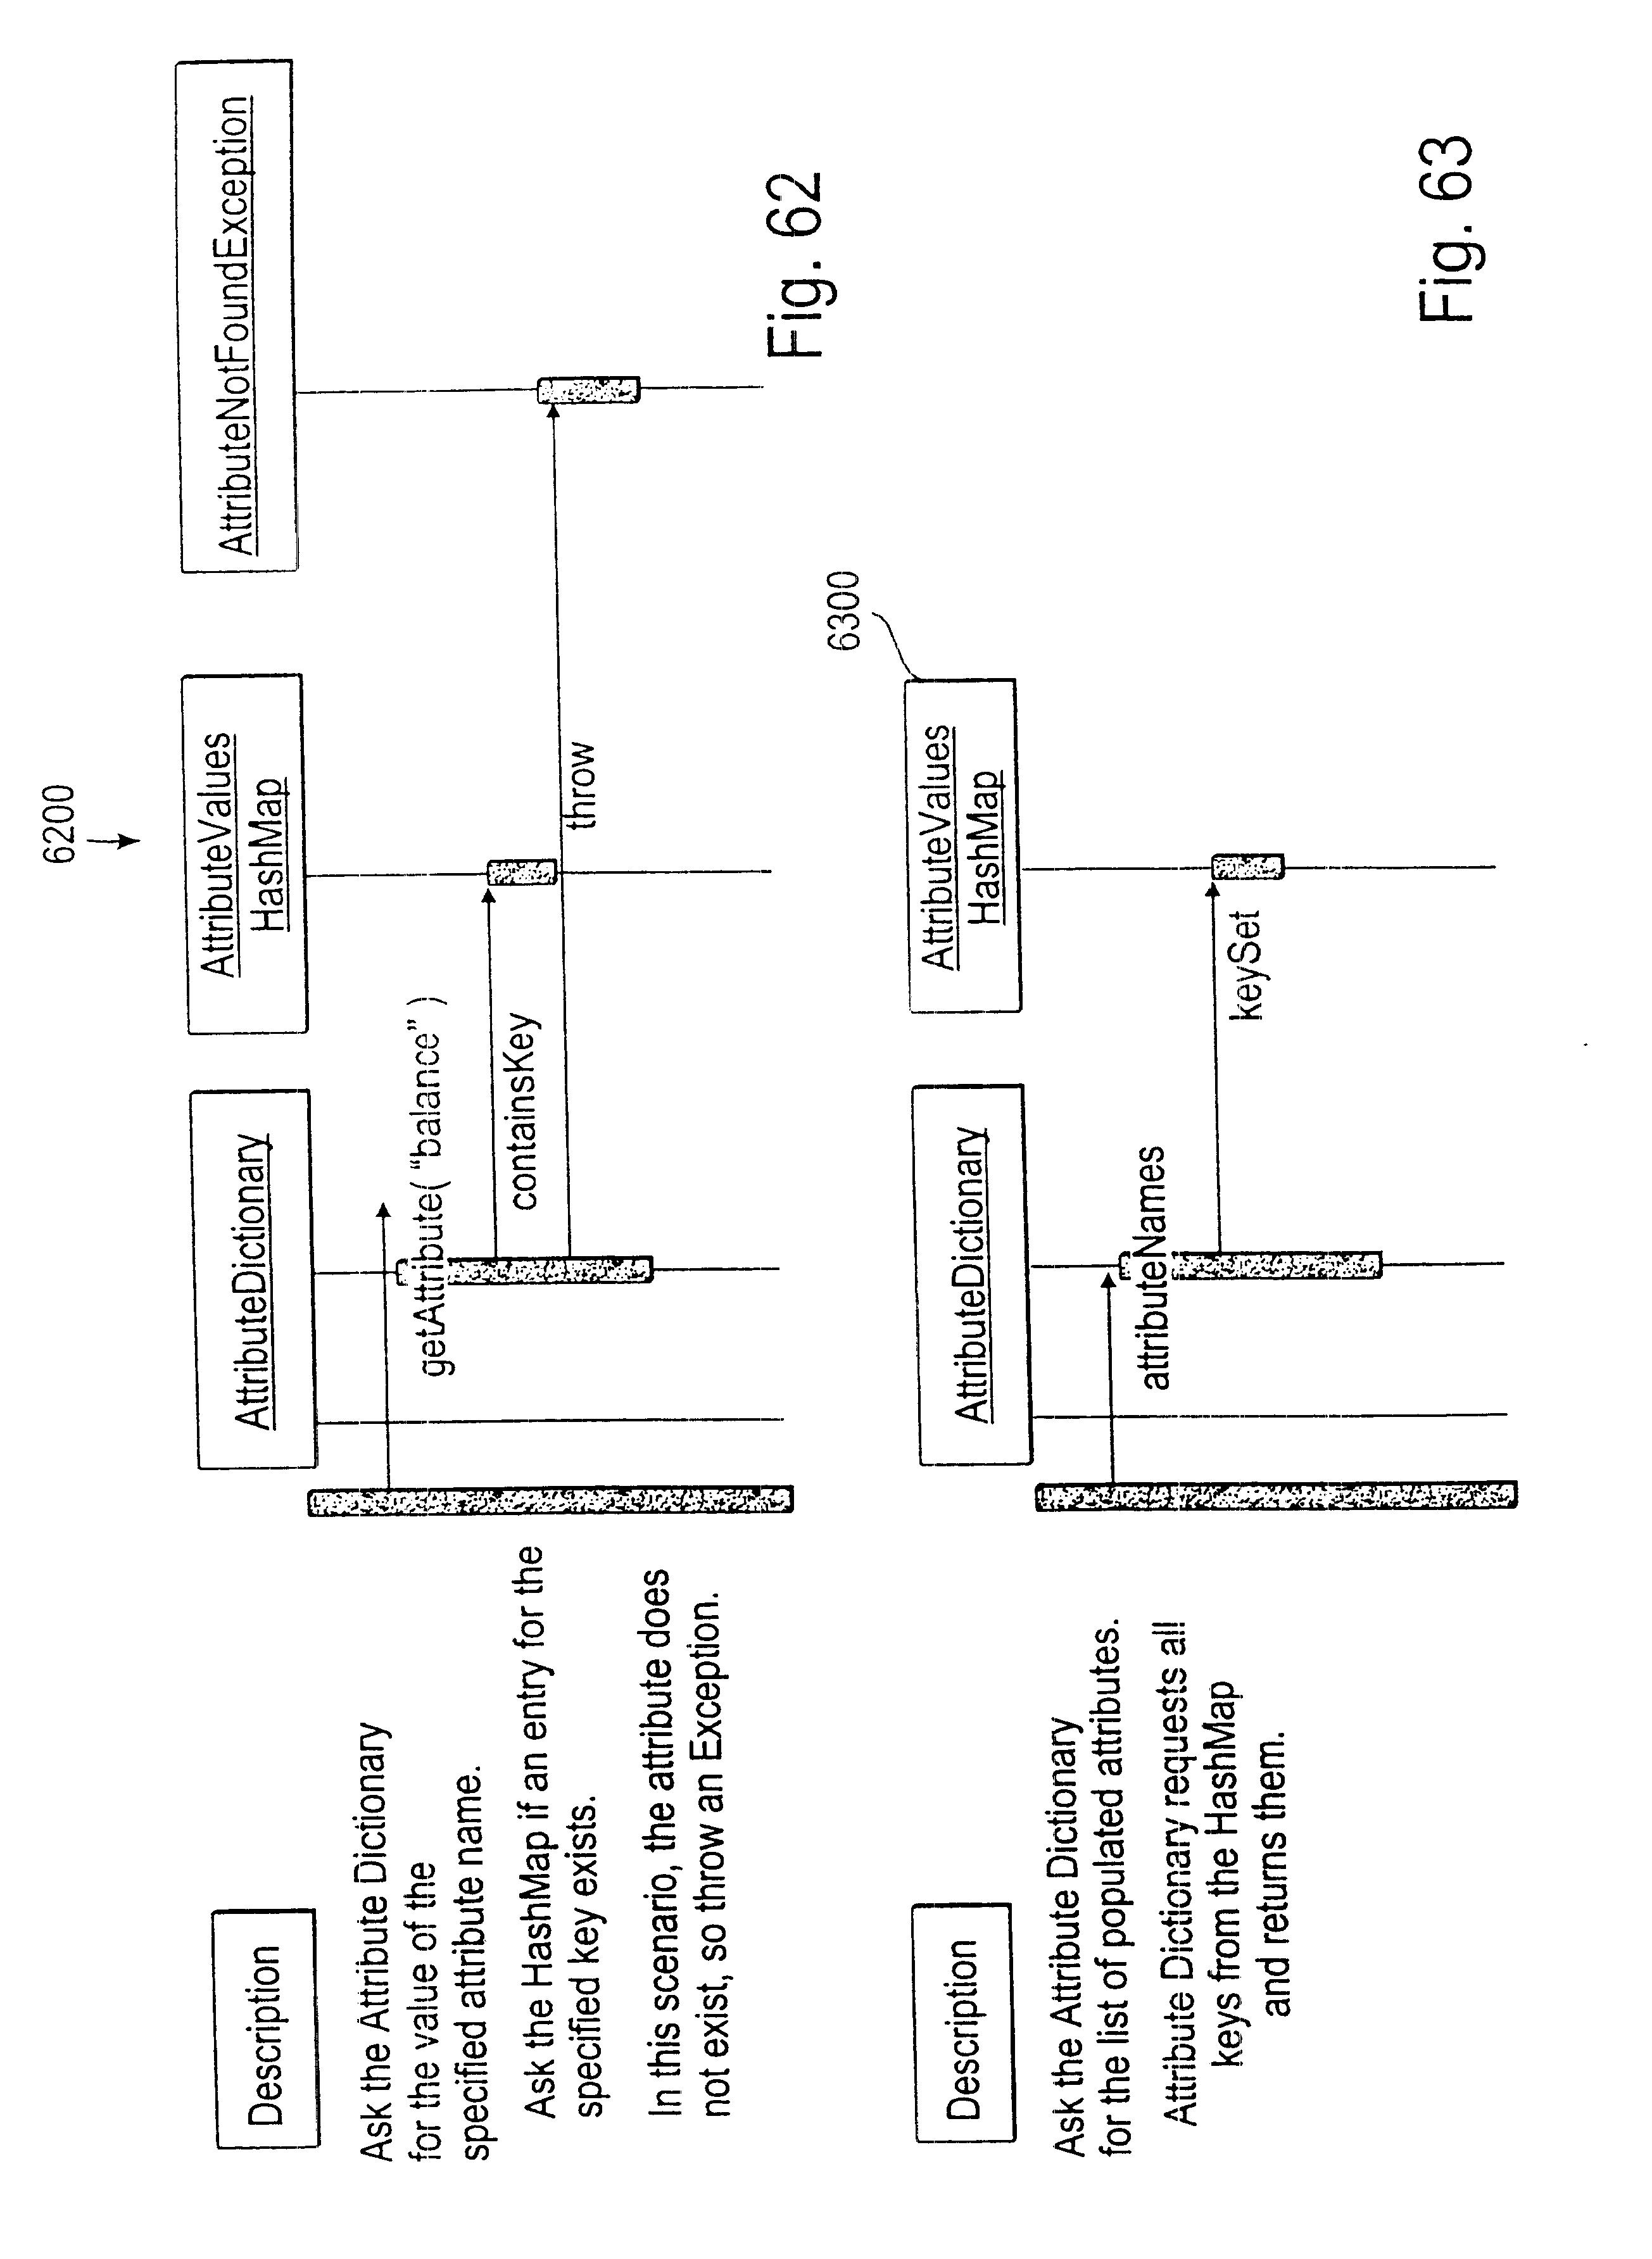 Audio Mixer Circuit Diagram Tradeoficcom - Wiring Diagram Write on 4 channel dj mixer, 4 channel pa amp mixer, 4 channel mixer amplifier, 4 channel remote control circuit, 4 channel line mixer, 4 channel microphone mixer, 4 channel mini mixer,